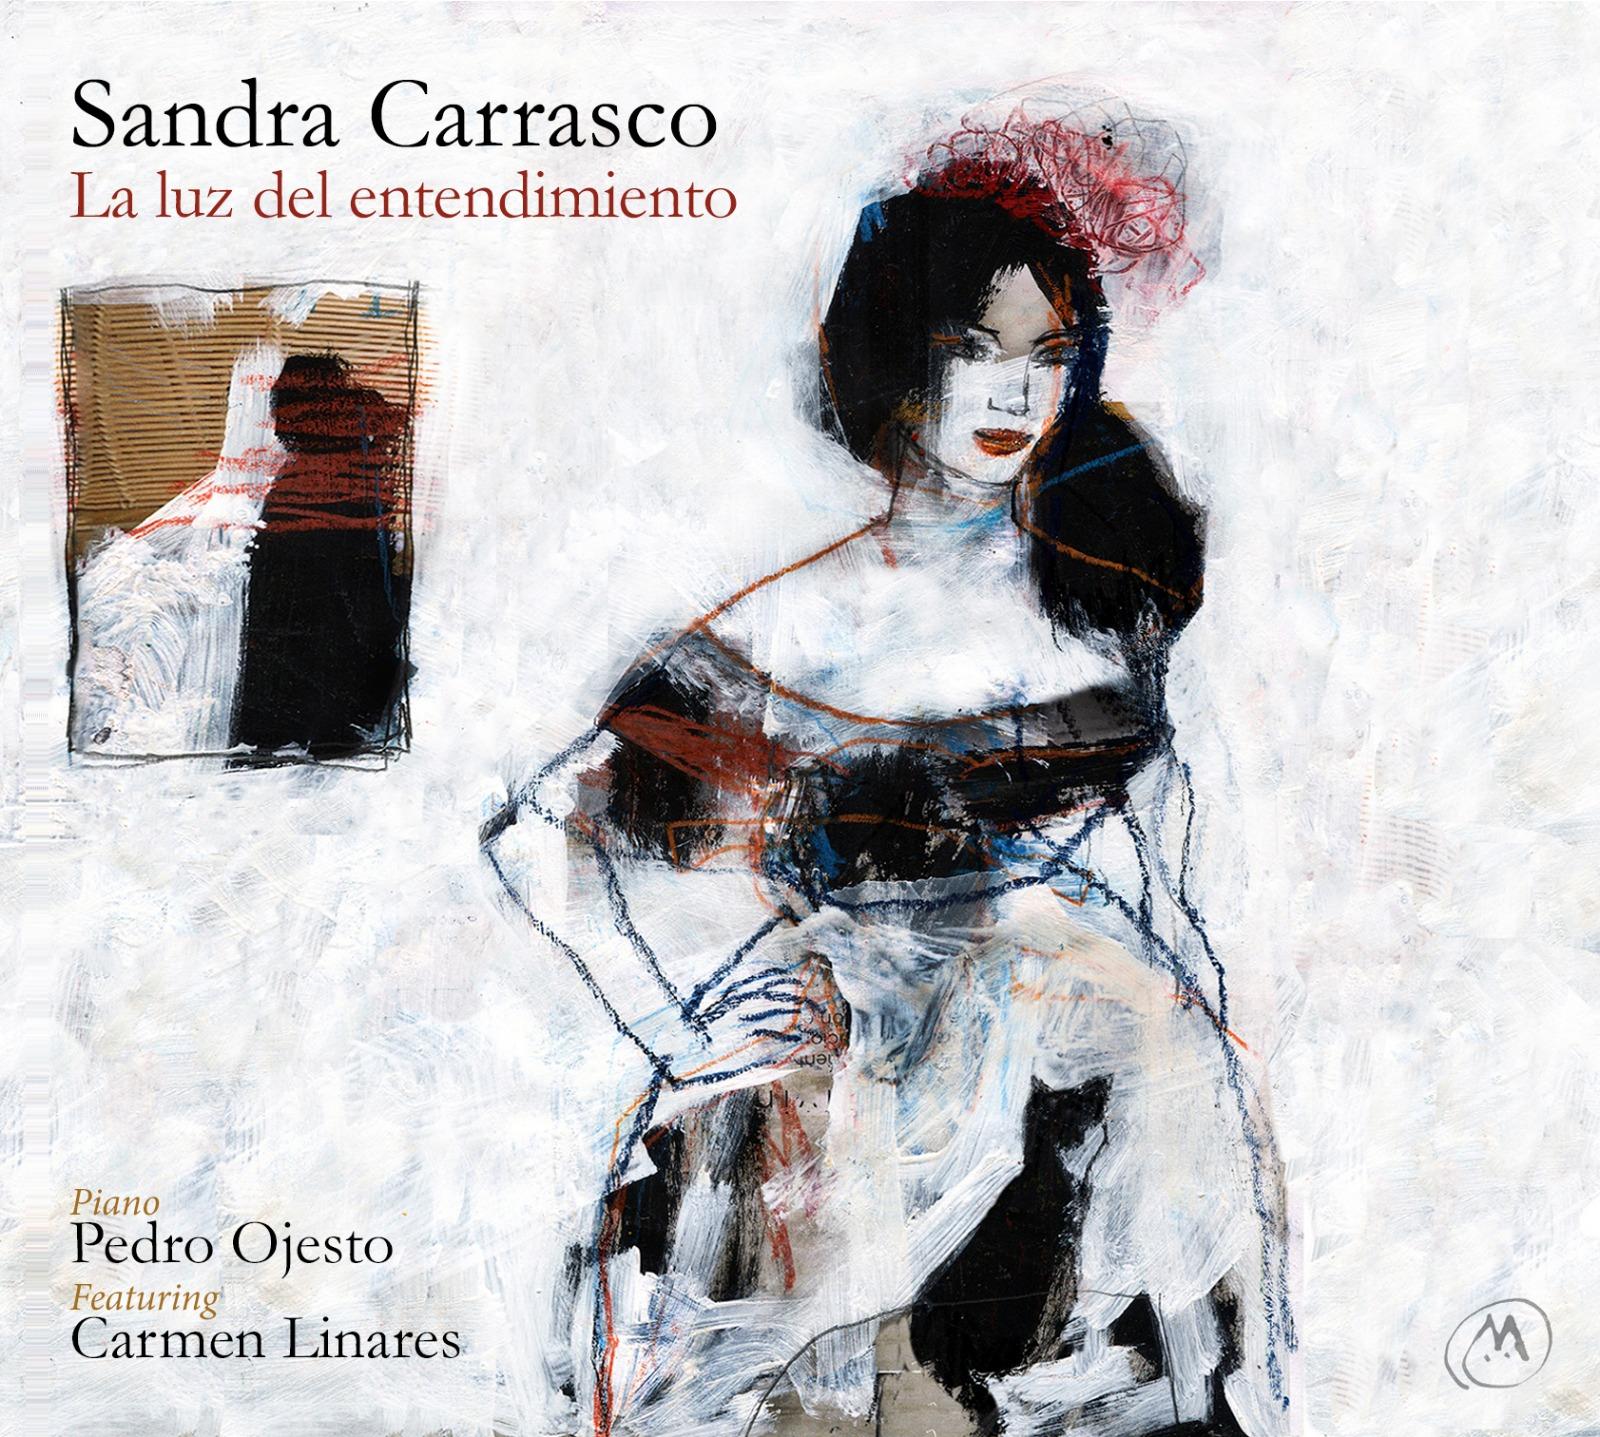 Sandra Carrasco La luz del entendimiento